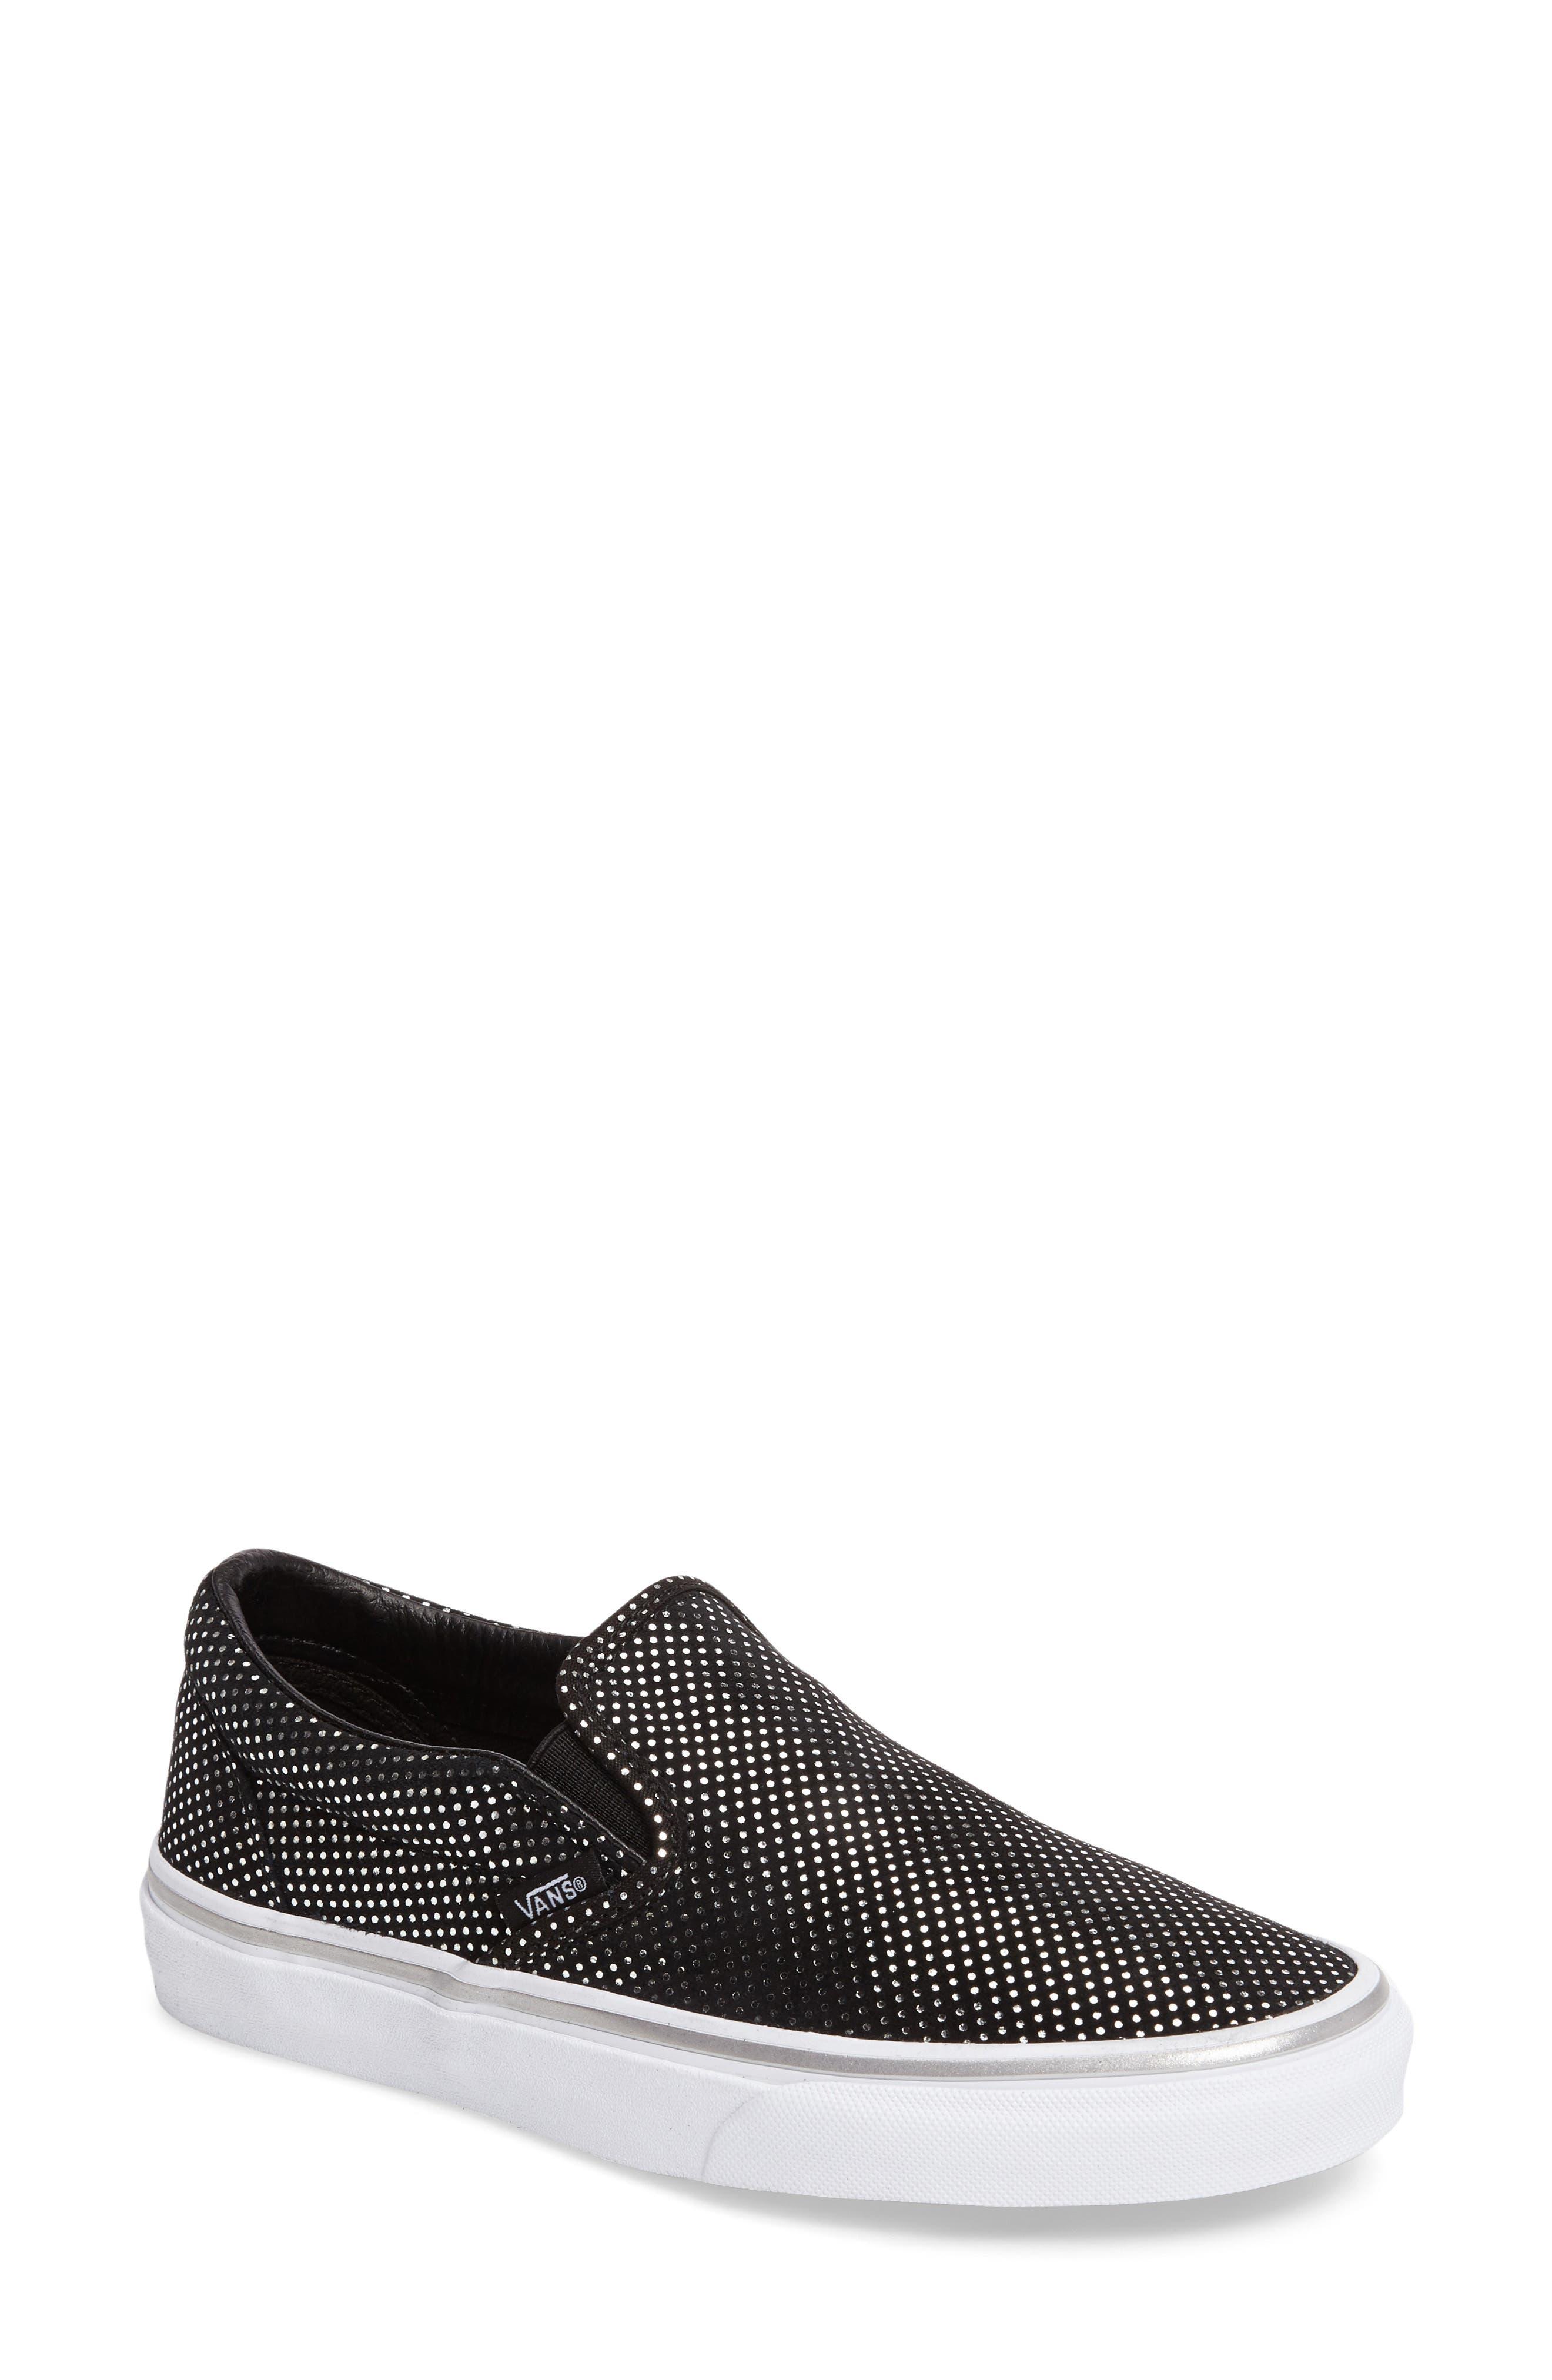 Classic Slip-On Sneaker,                             Main thumbnail 1, color,                             004